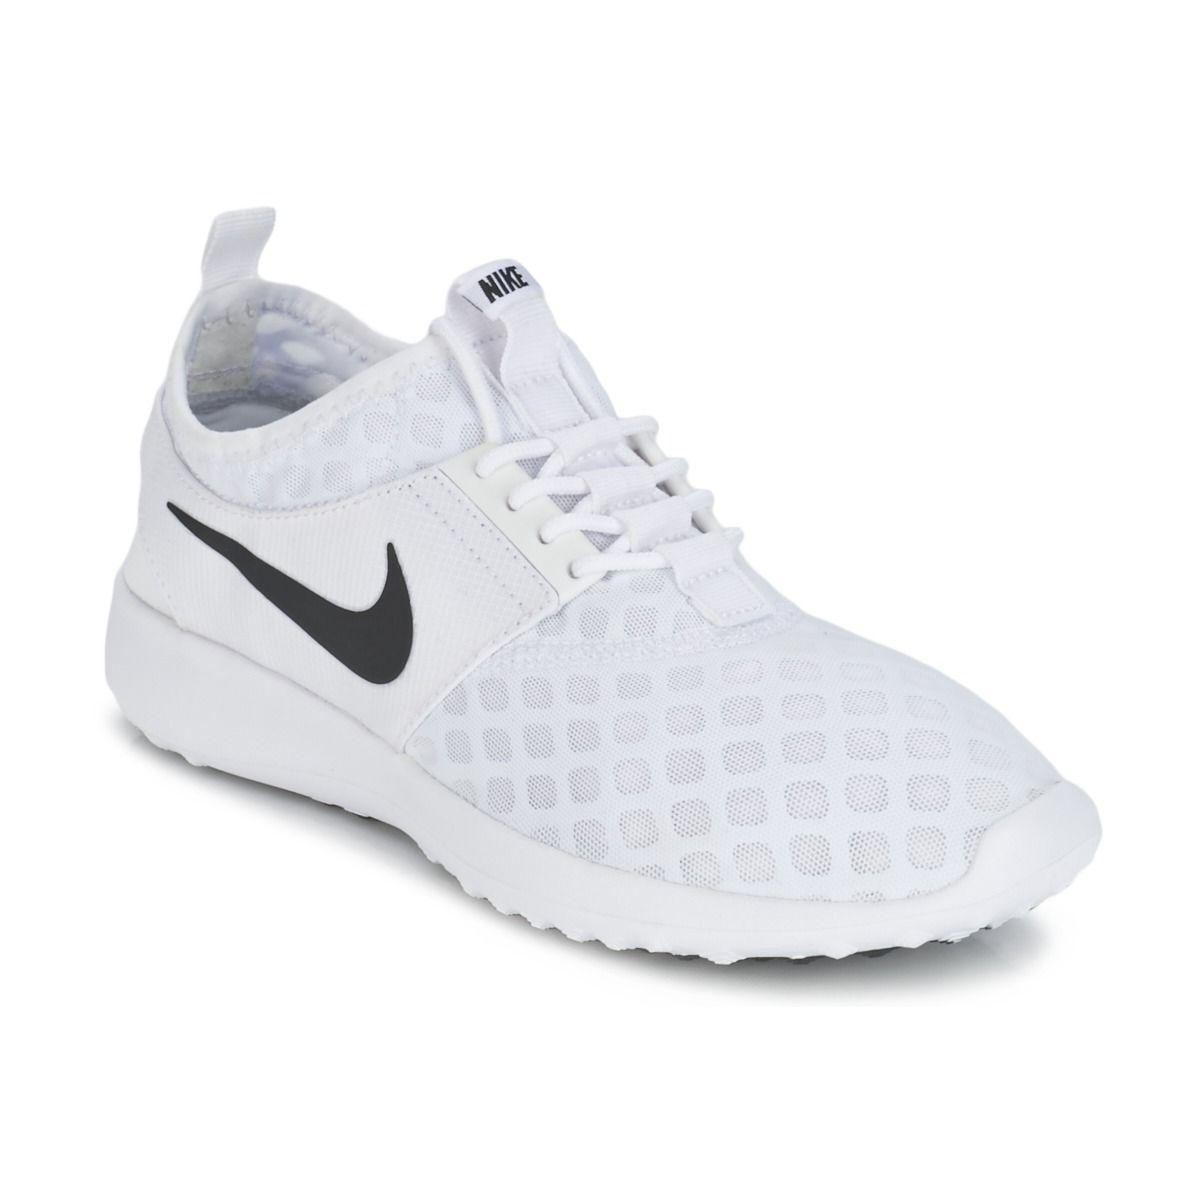 Nike JUVENATE W Blanc / Noir pas cher prix promo Baskets Femme Spartoo  94.99 €